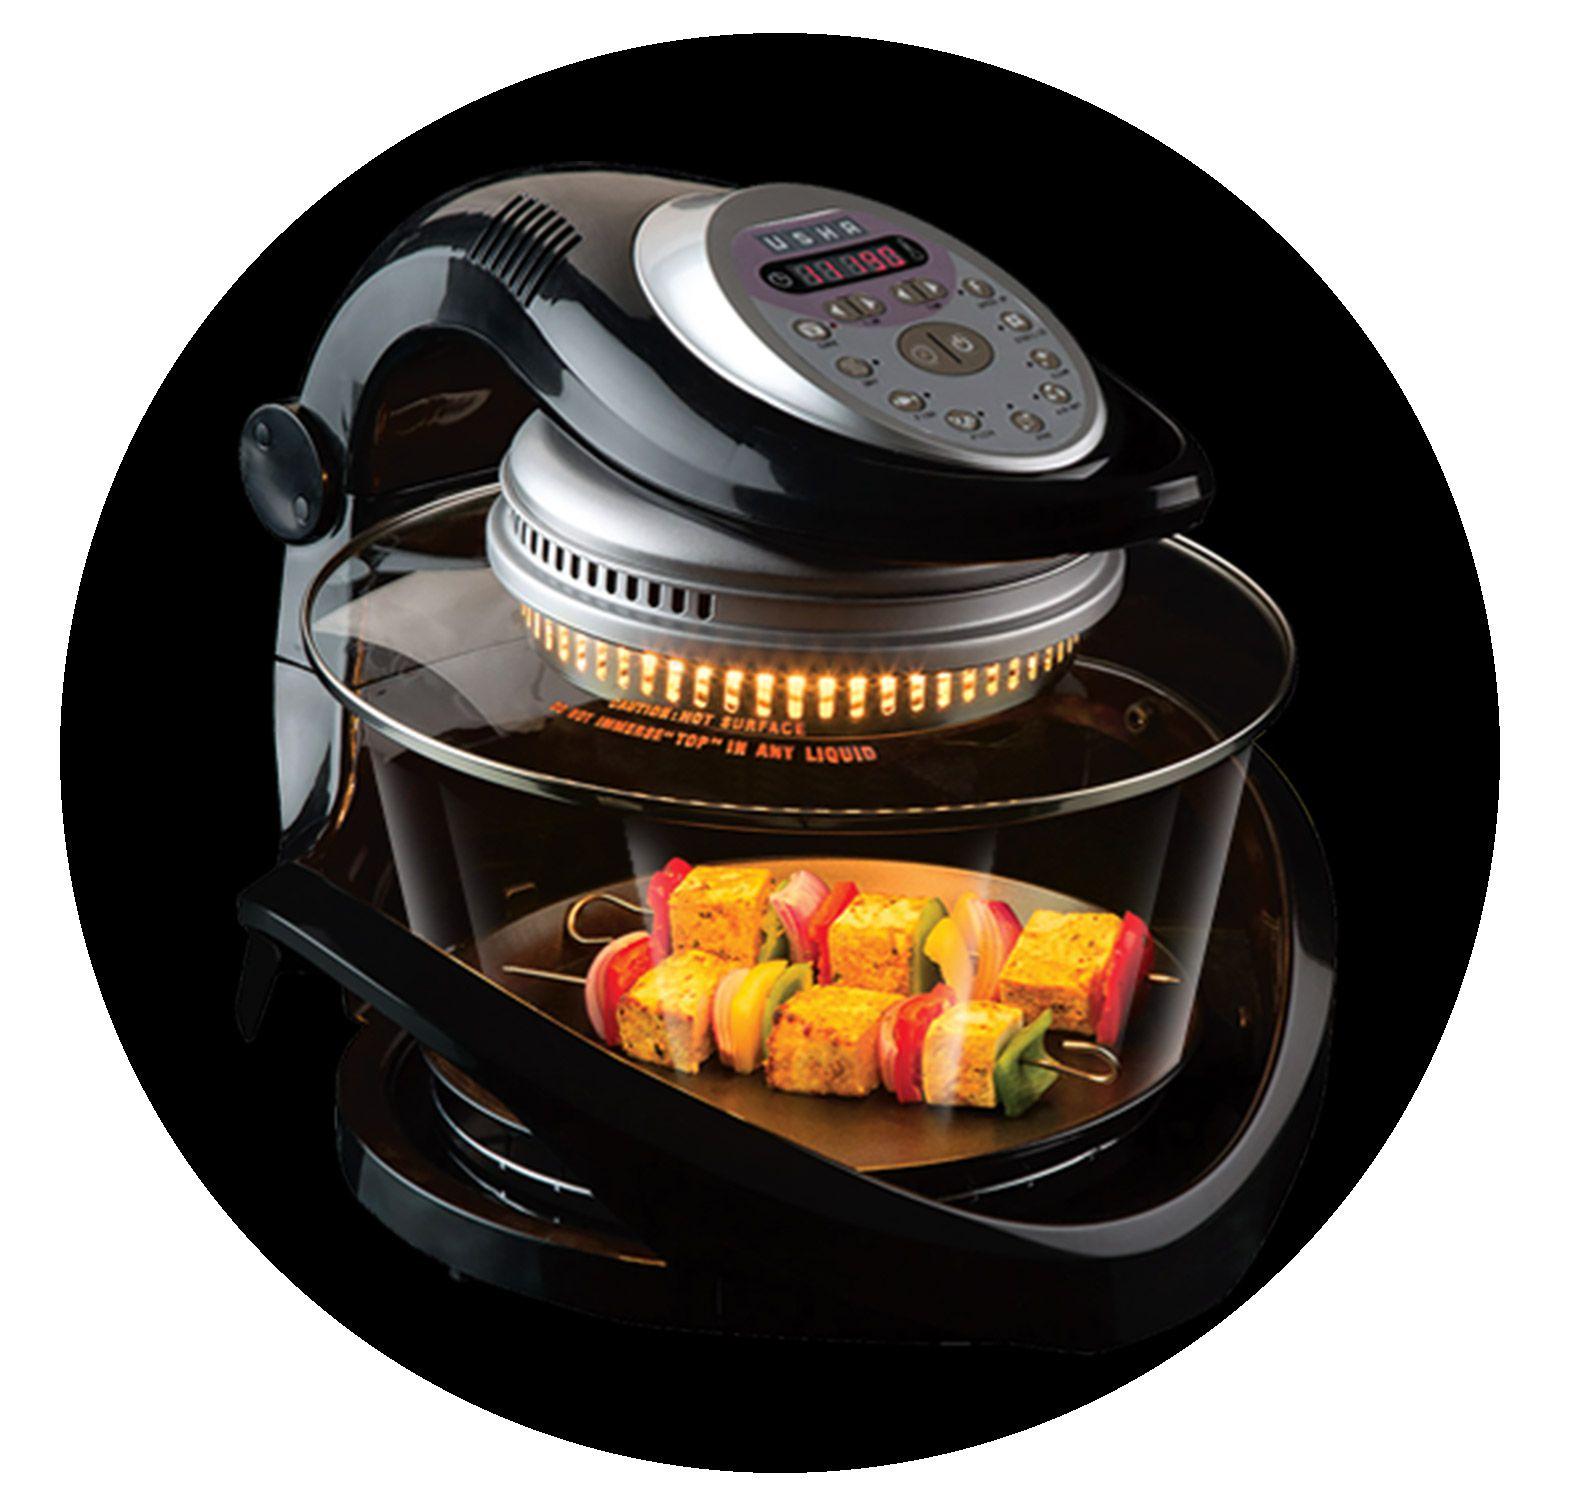 Usha 3514i 1300-Watt Infiniti Cook Halogen Oven (Transparent Glass)